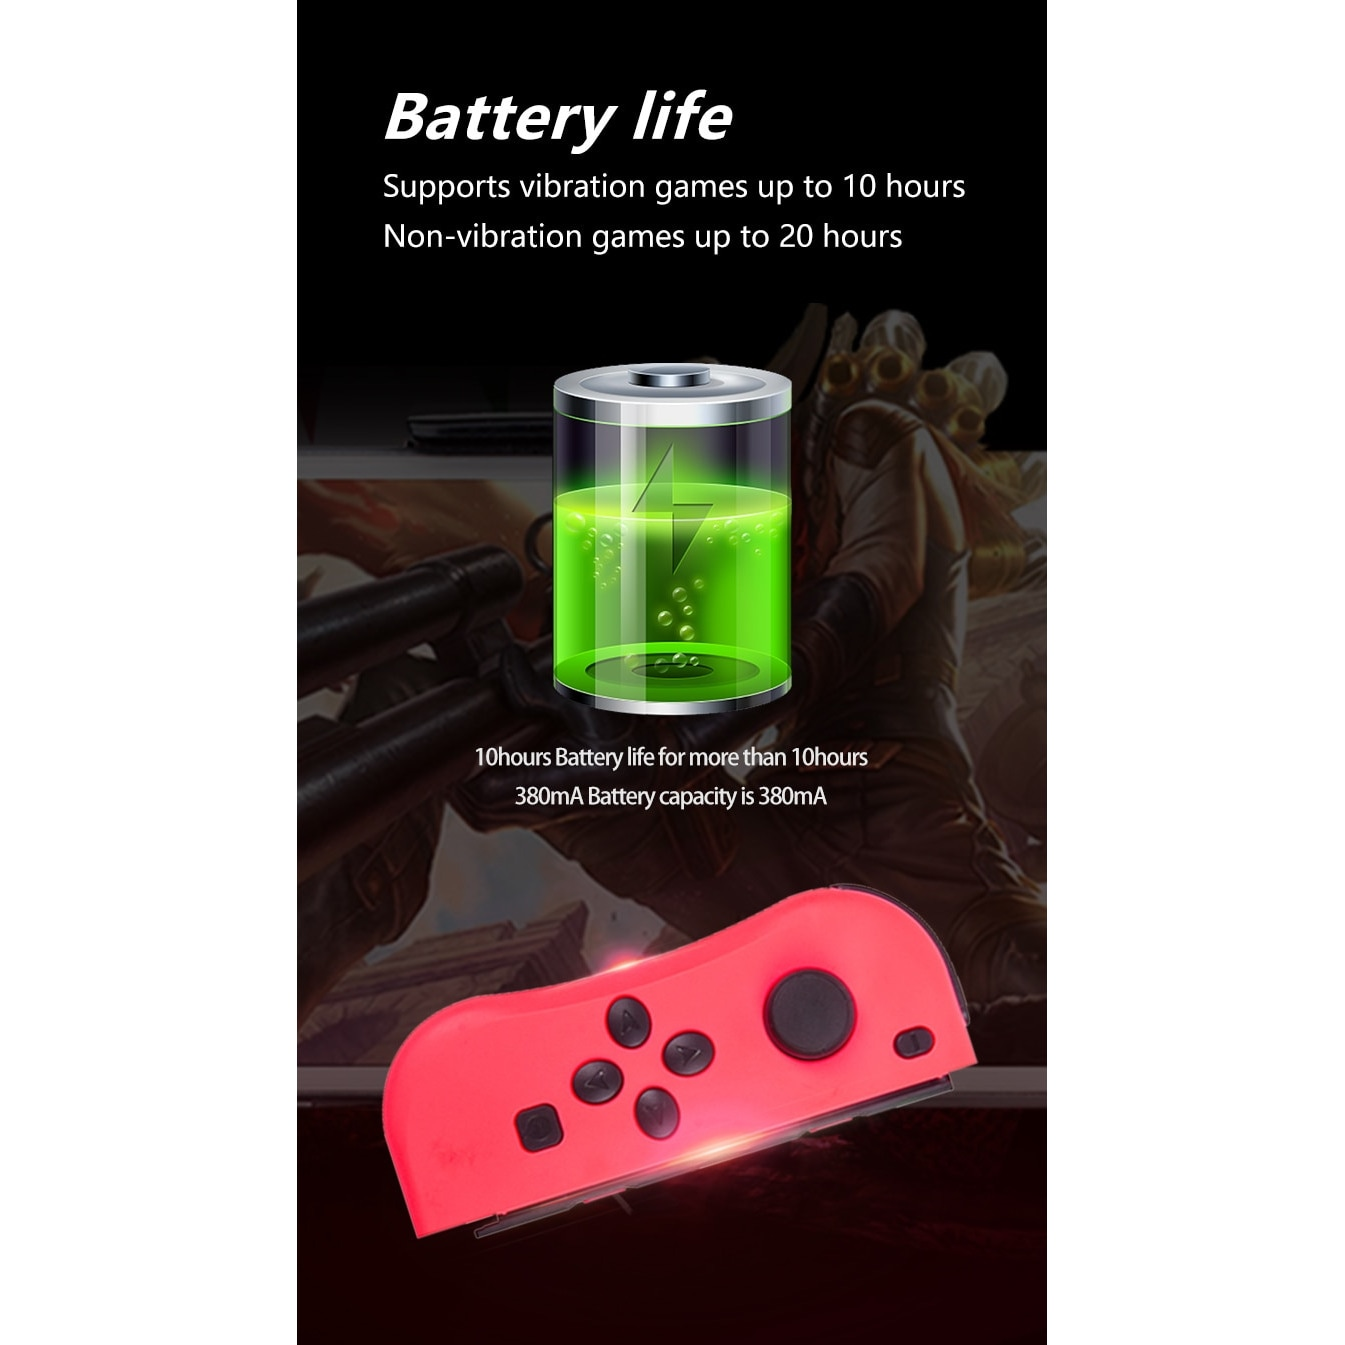 Wireless Joysticks for Nintendo Switch (L and R) Yellow - 3